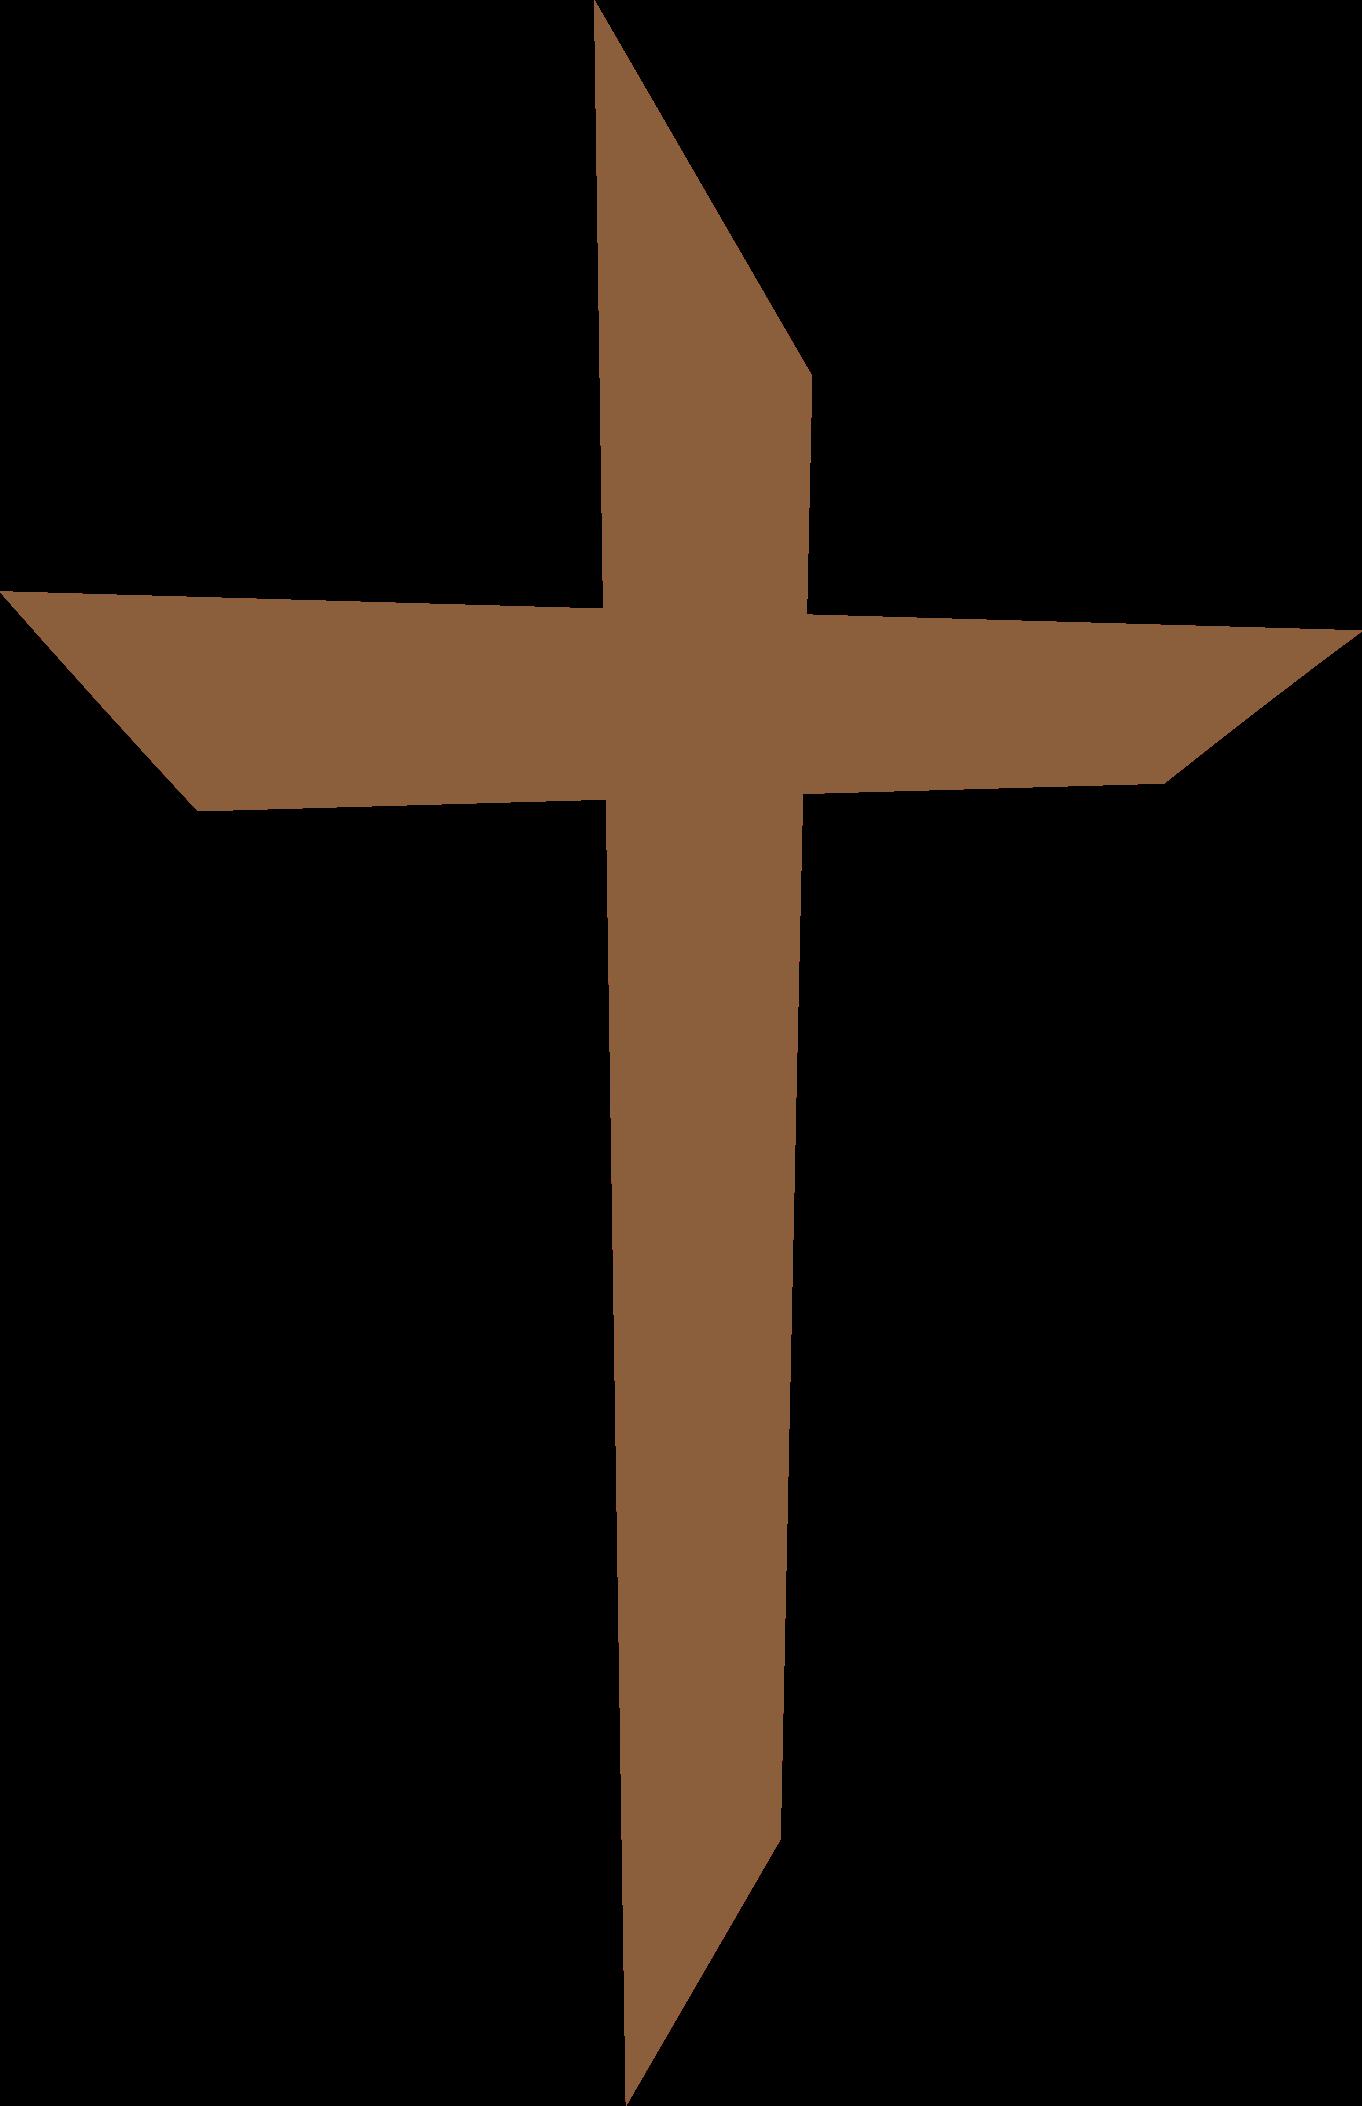 Cross Transparent.